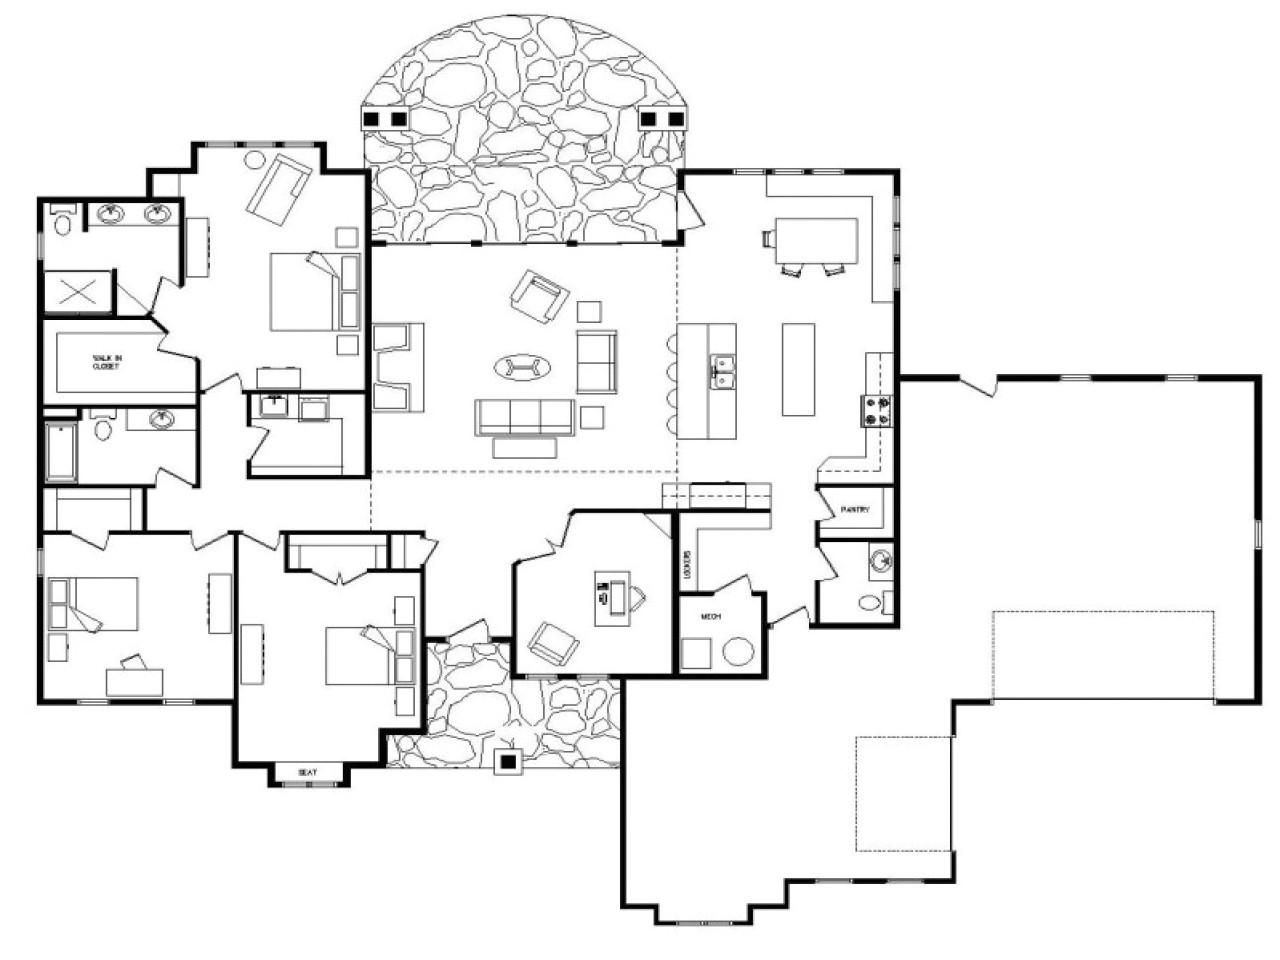 c8d730047ed8e12e open floor plans one level homes open floor plans ranch style